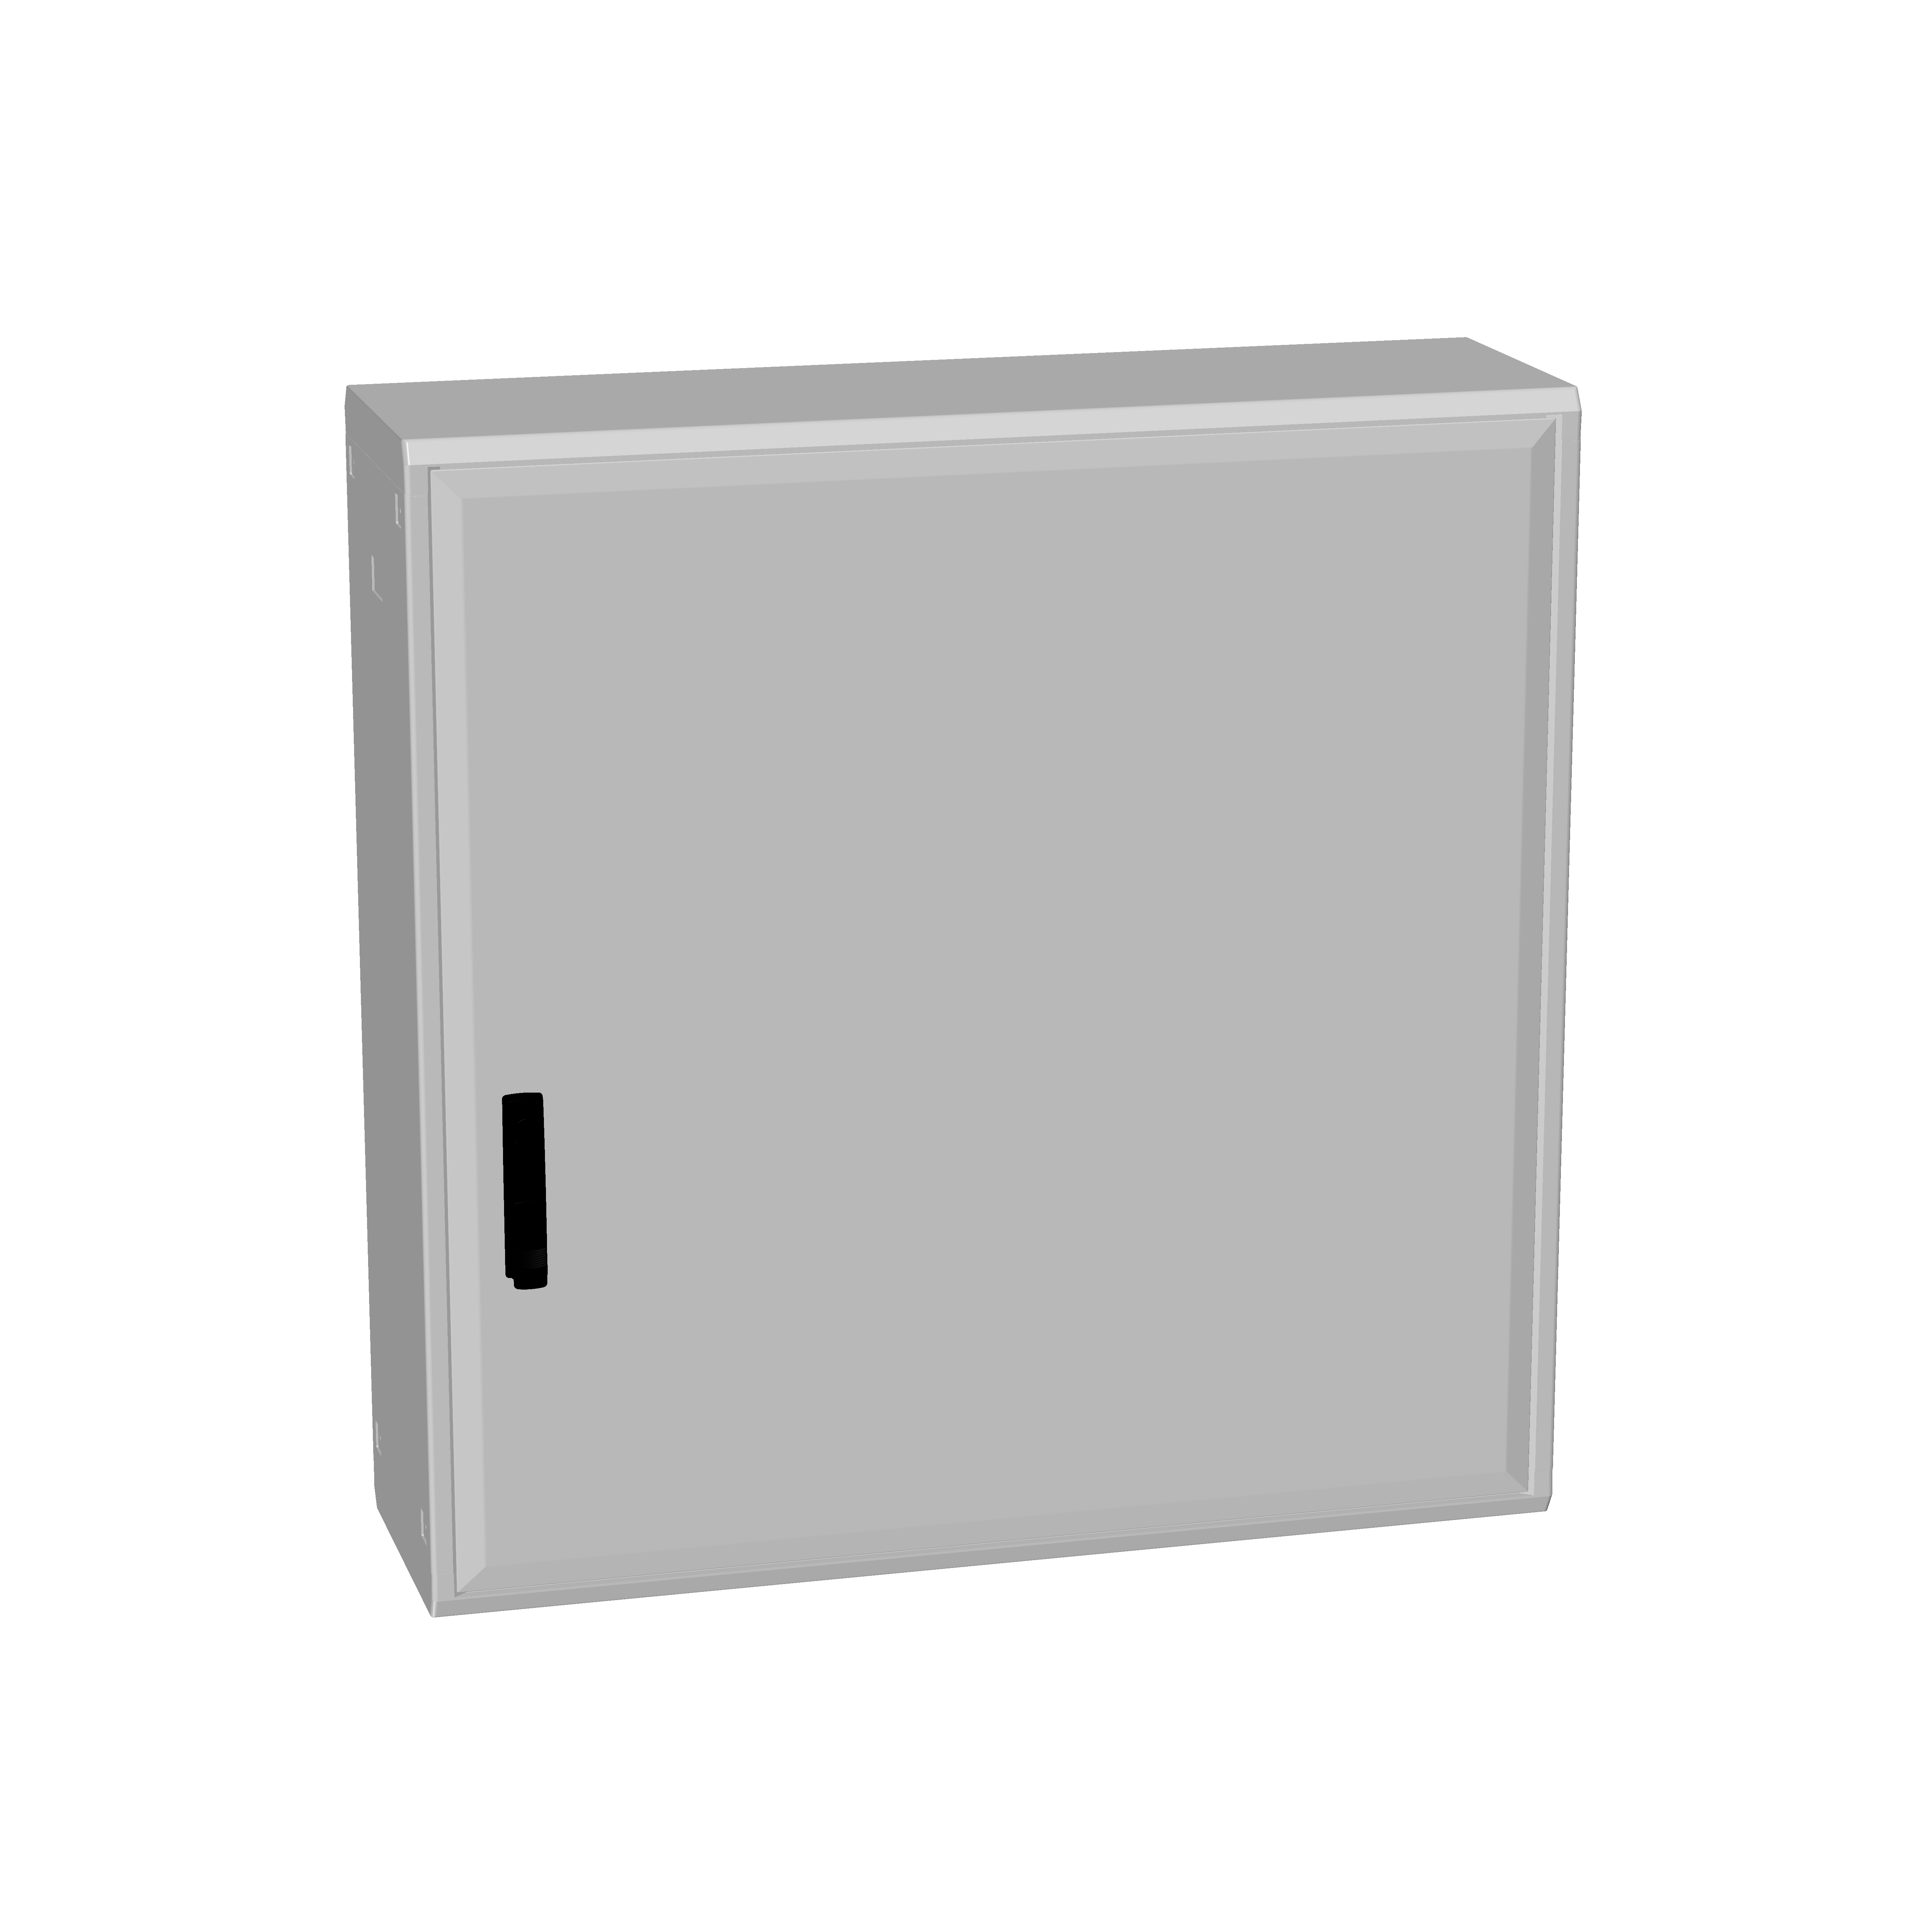 1 Stk Polyesterschrank, eintürig, 1000x1000x312 POCC4430--